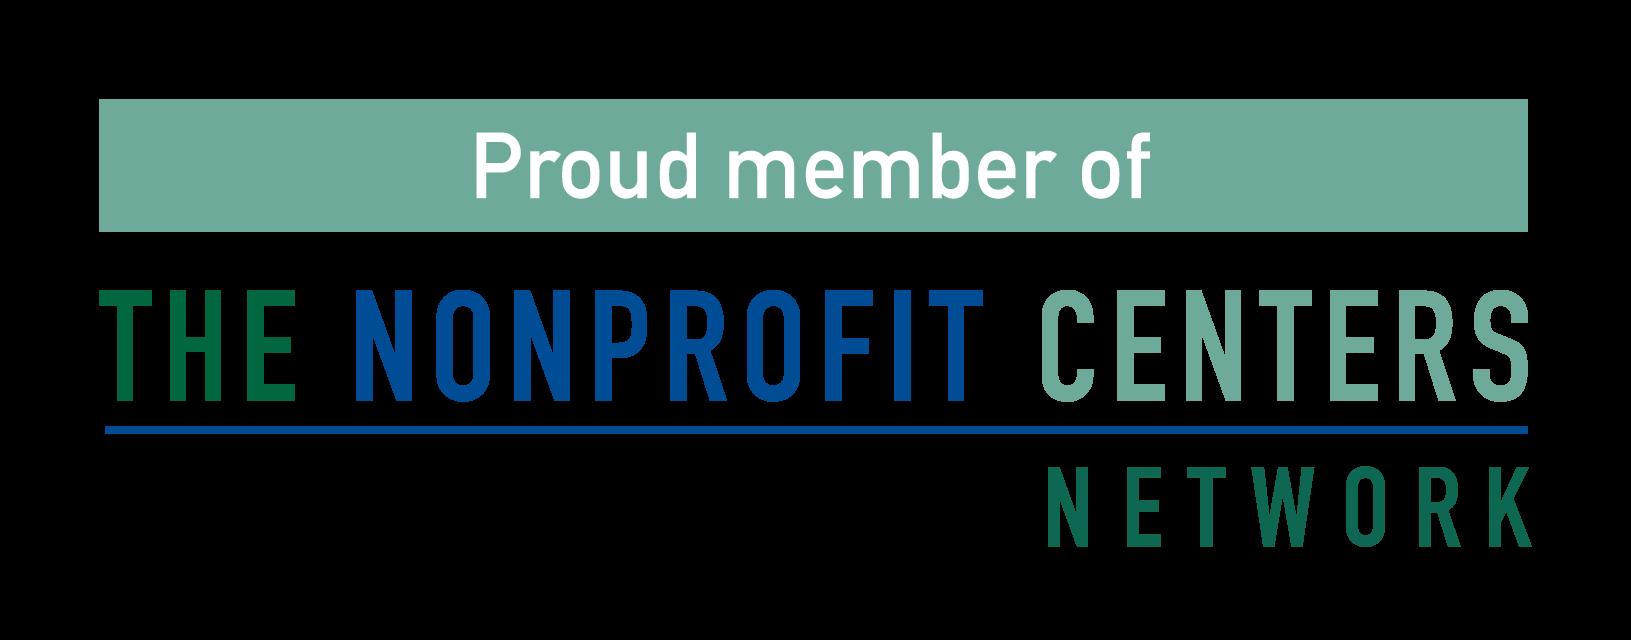 NCN_proud_member_mark_v1-01.png